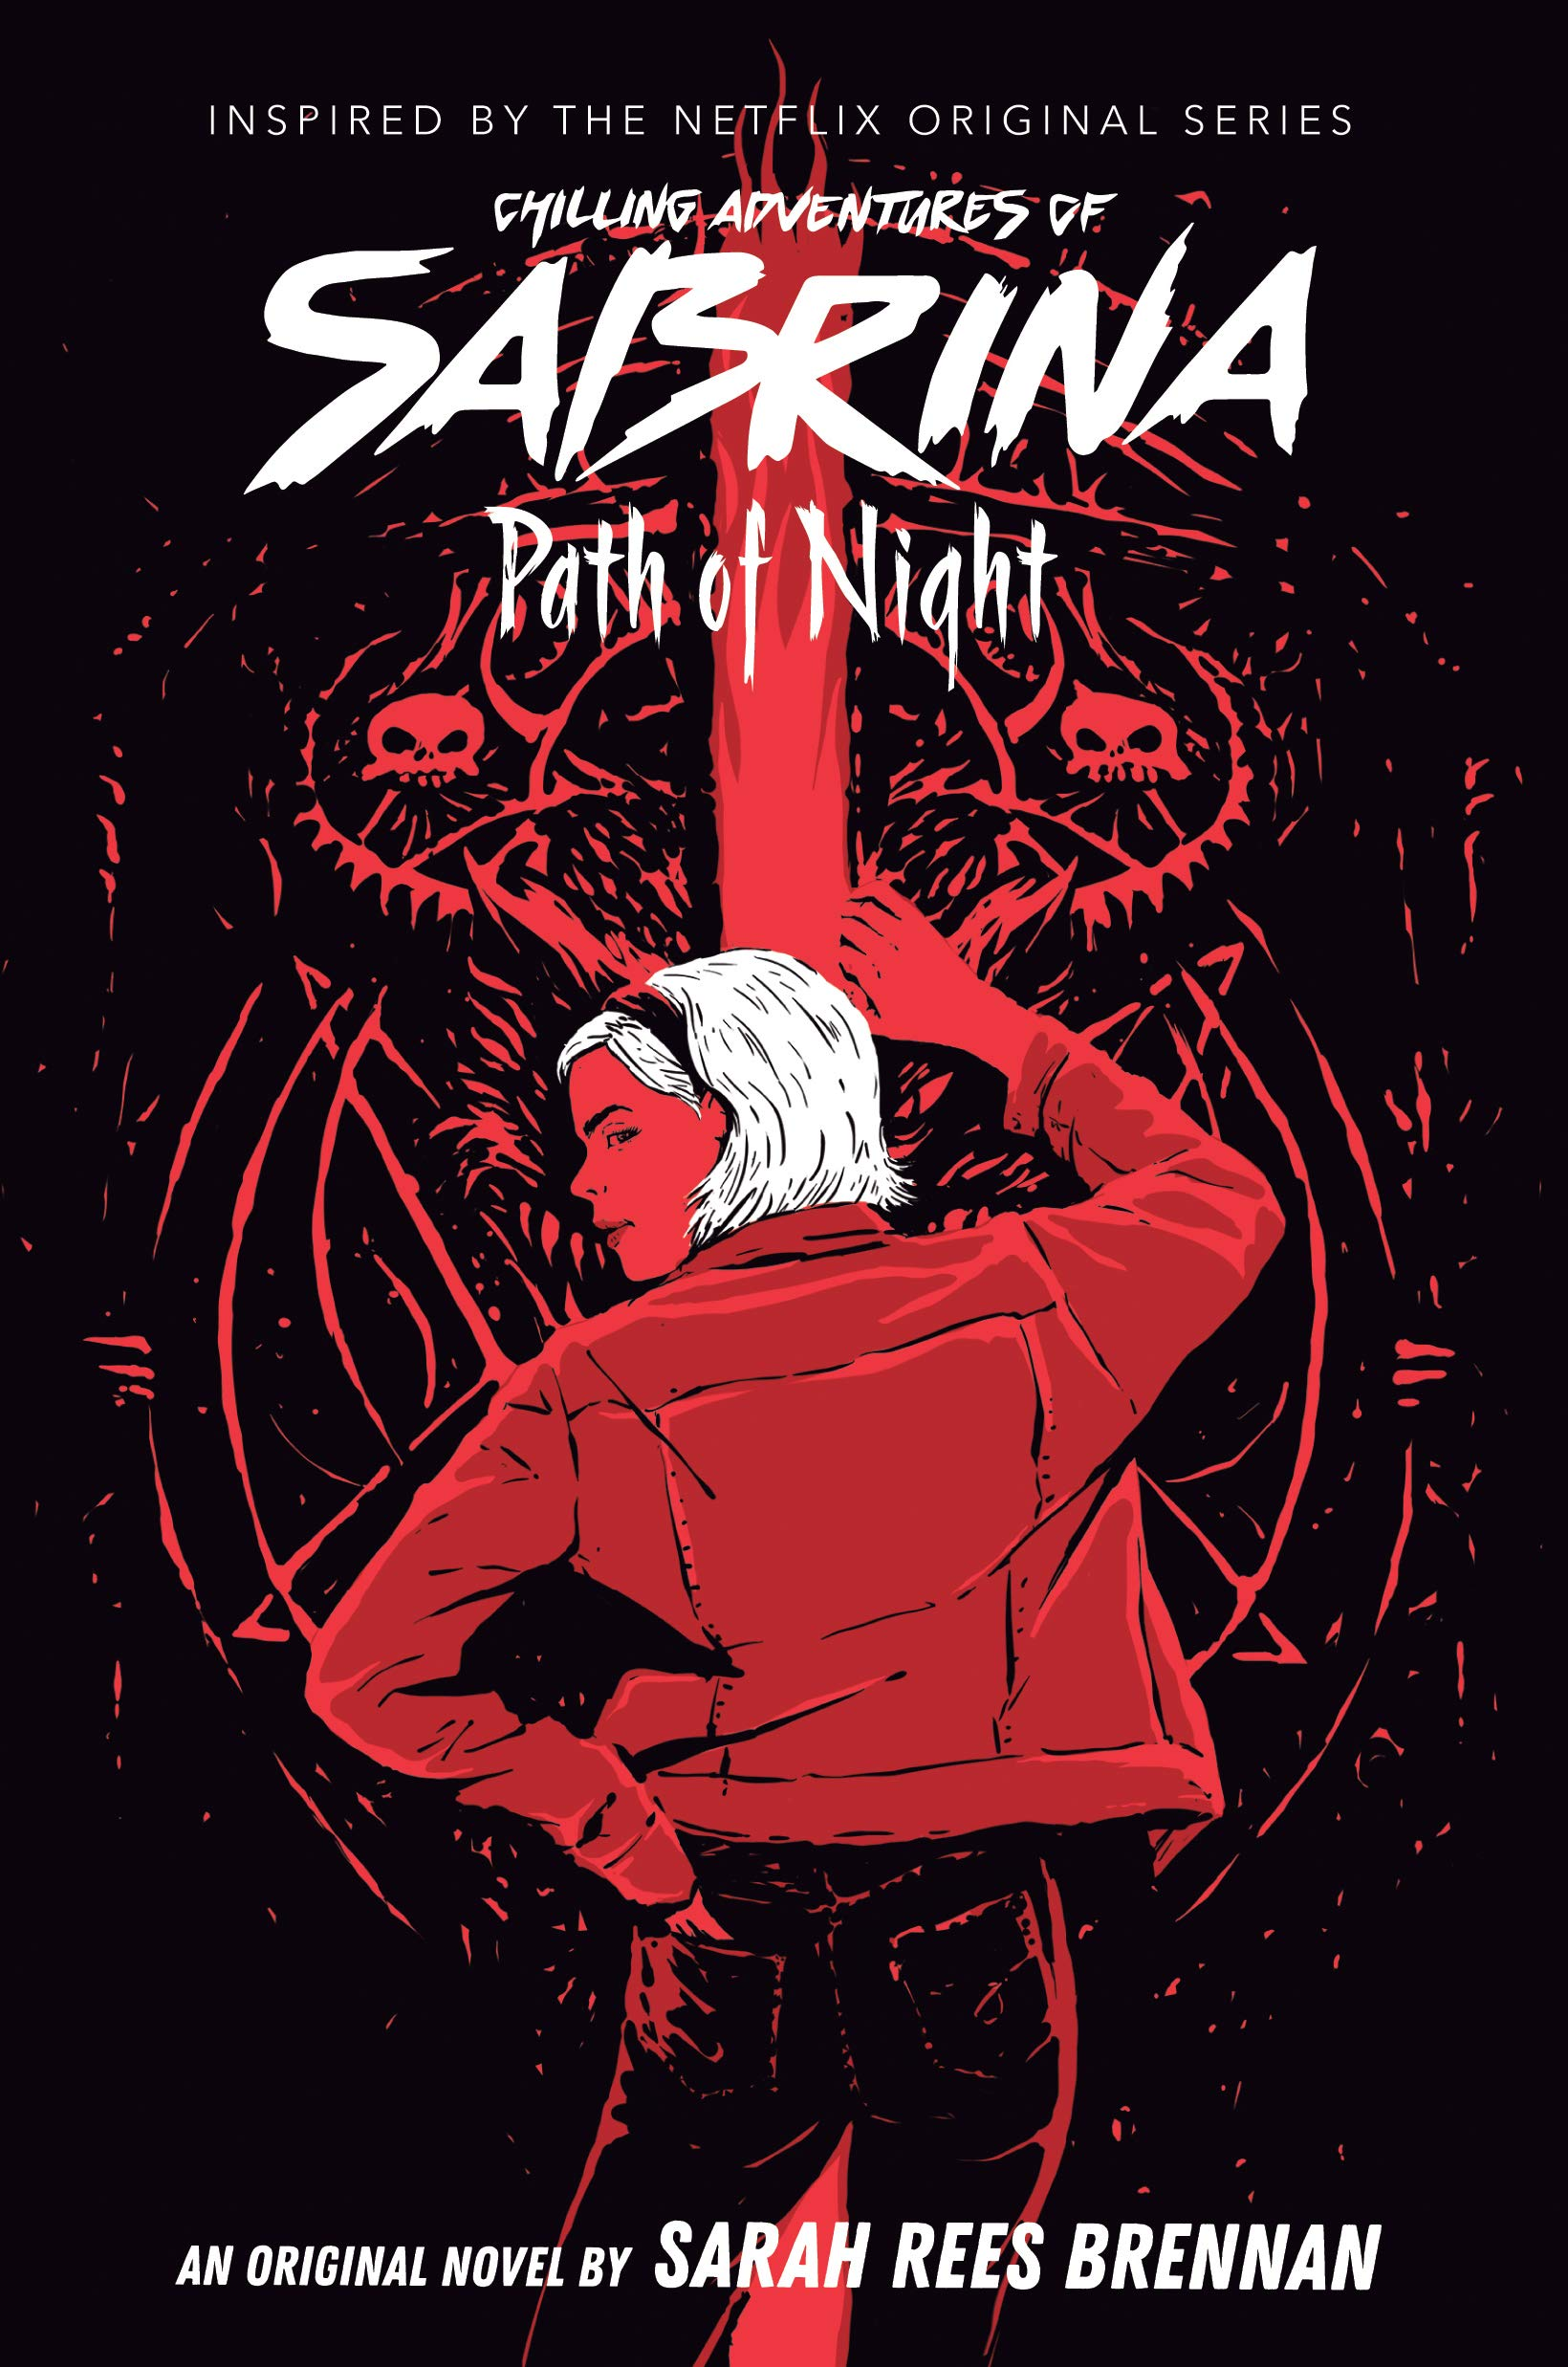 Path of Night (Chilling Adventures of Sabrina 3) - Sarah Rees Brennan